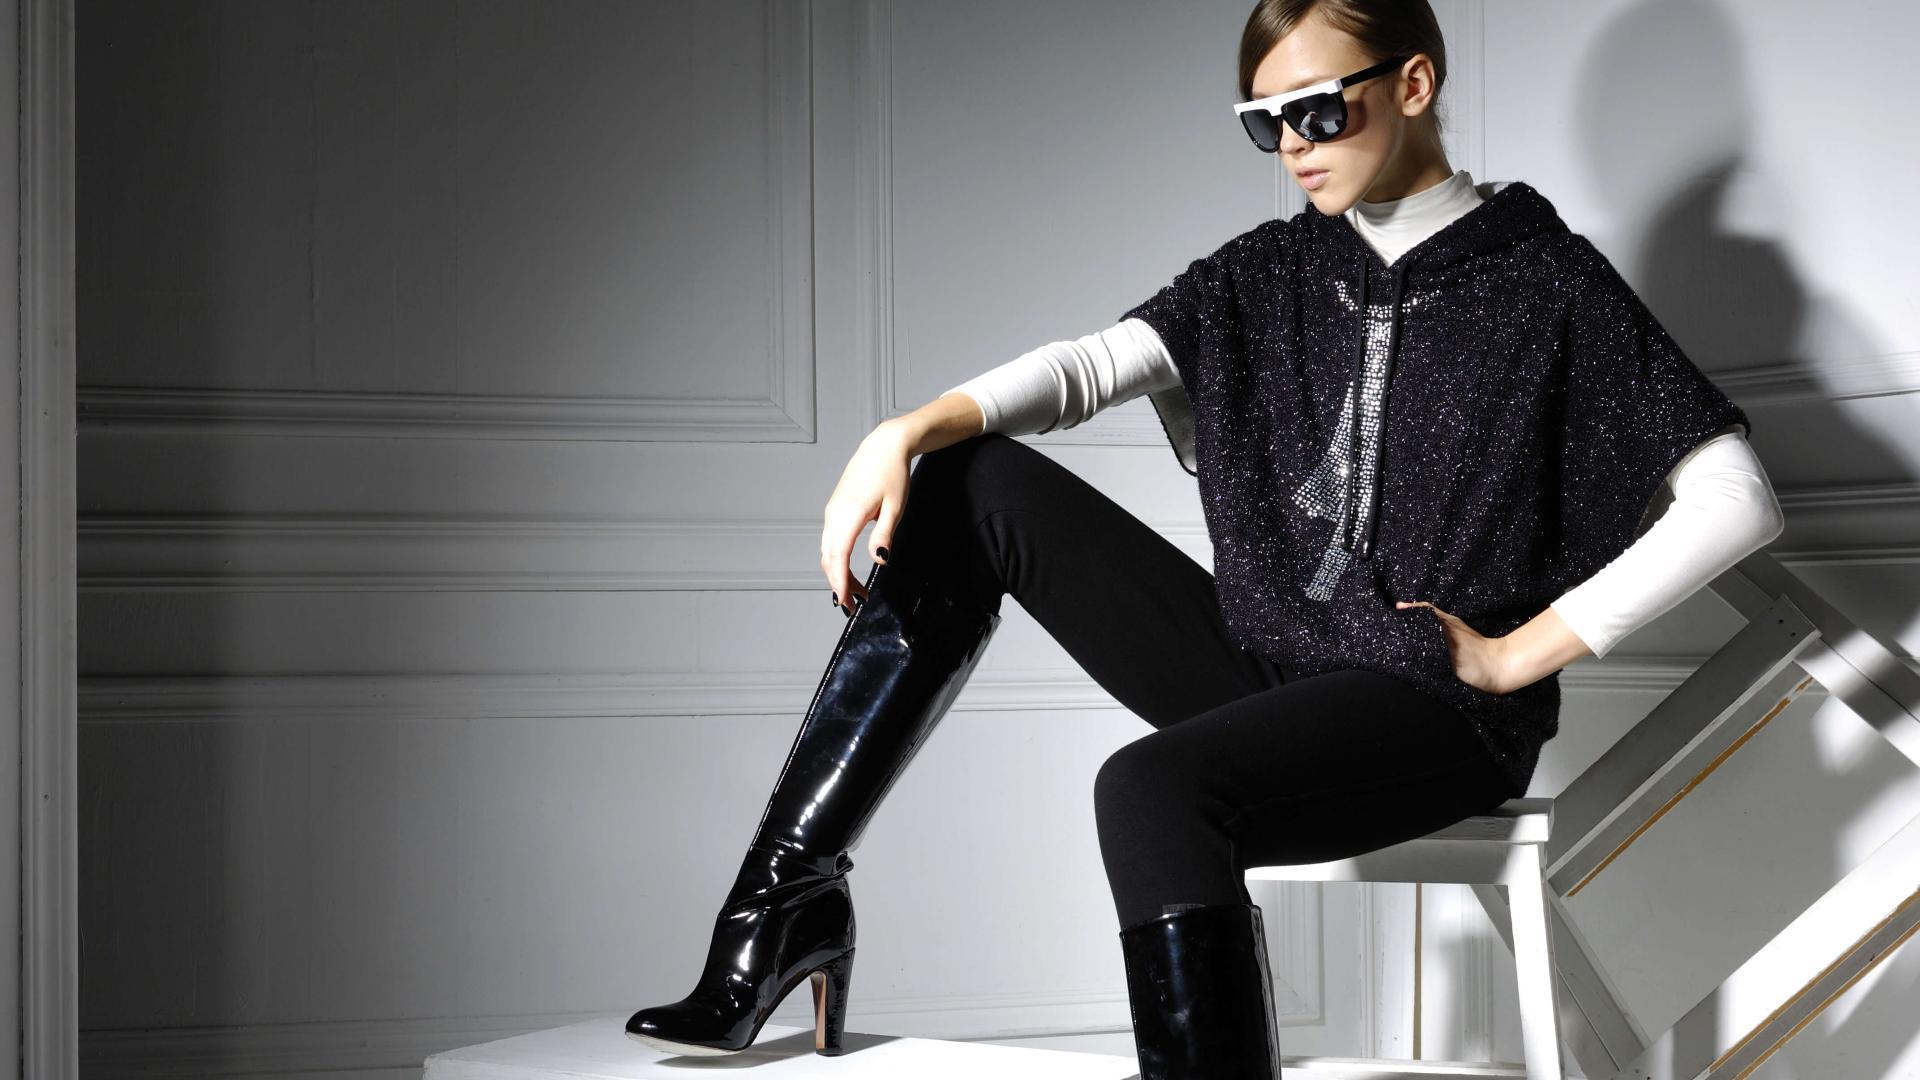 Songs to Invoke Fashion